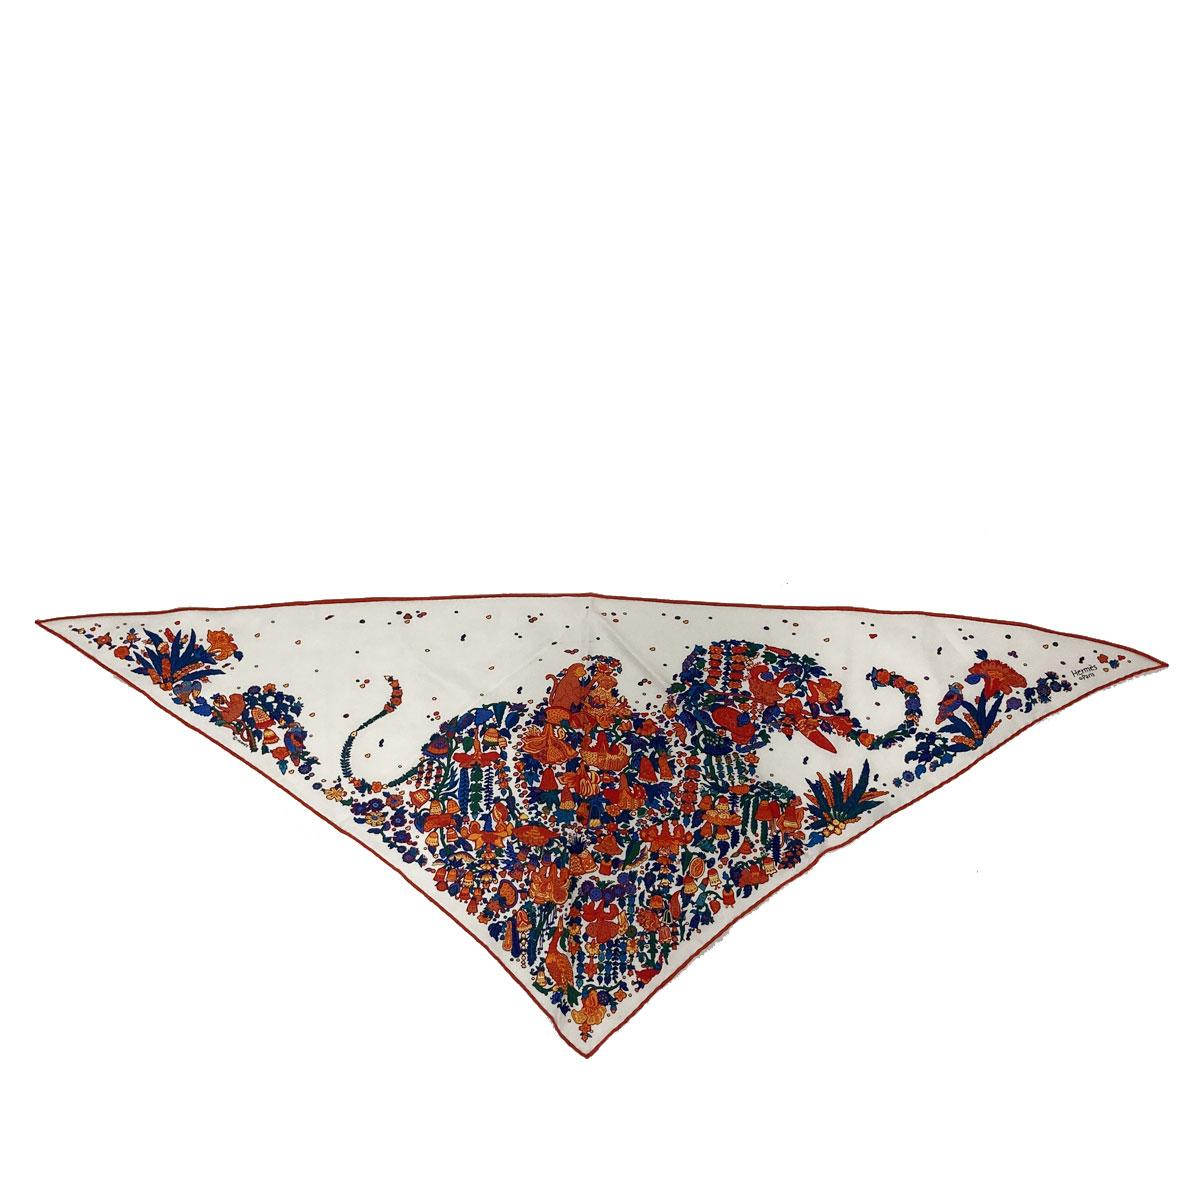 HERMES エルメス 三角スカーフ ポワントゥ シルク100% マルチカラー